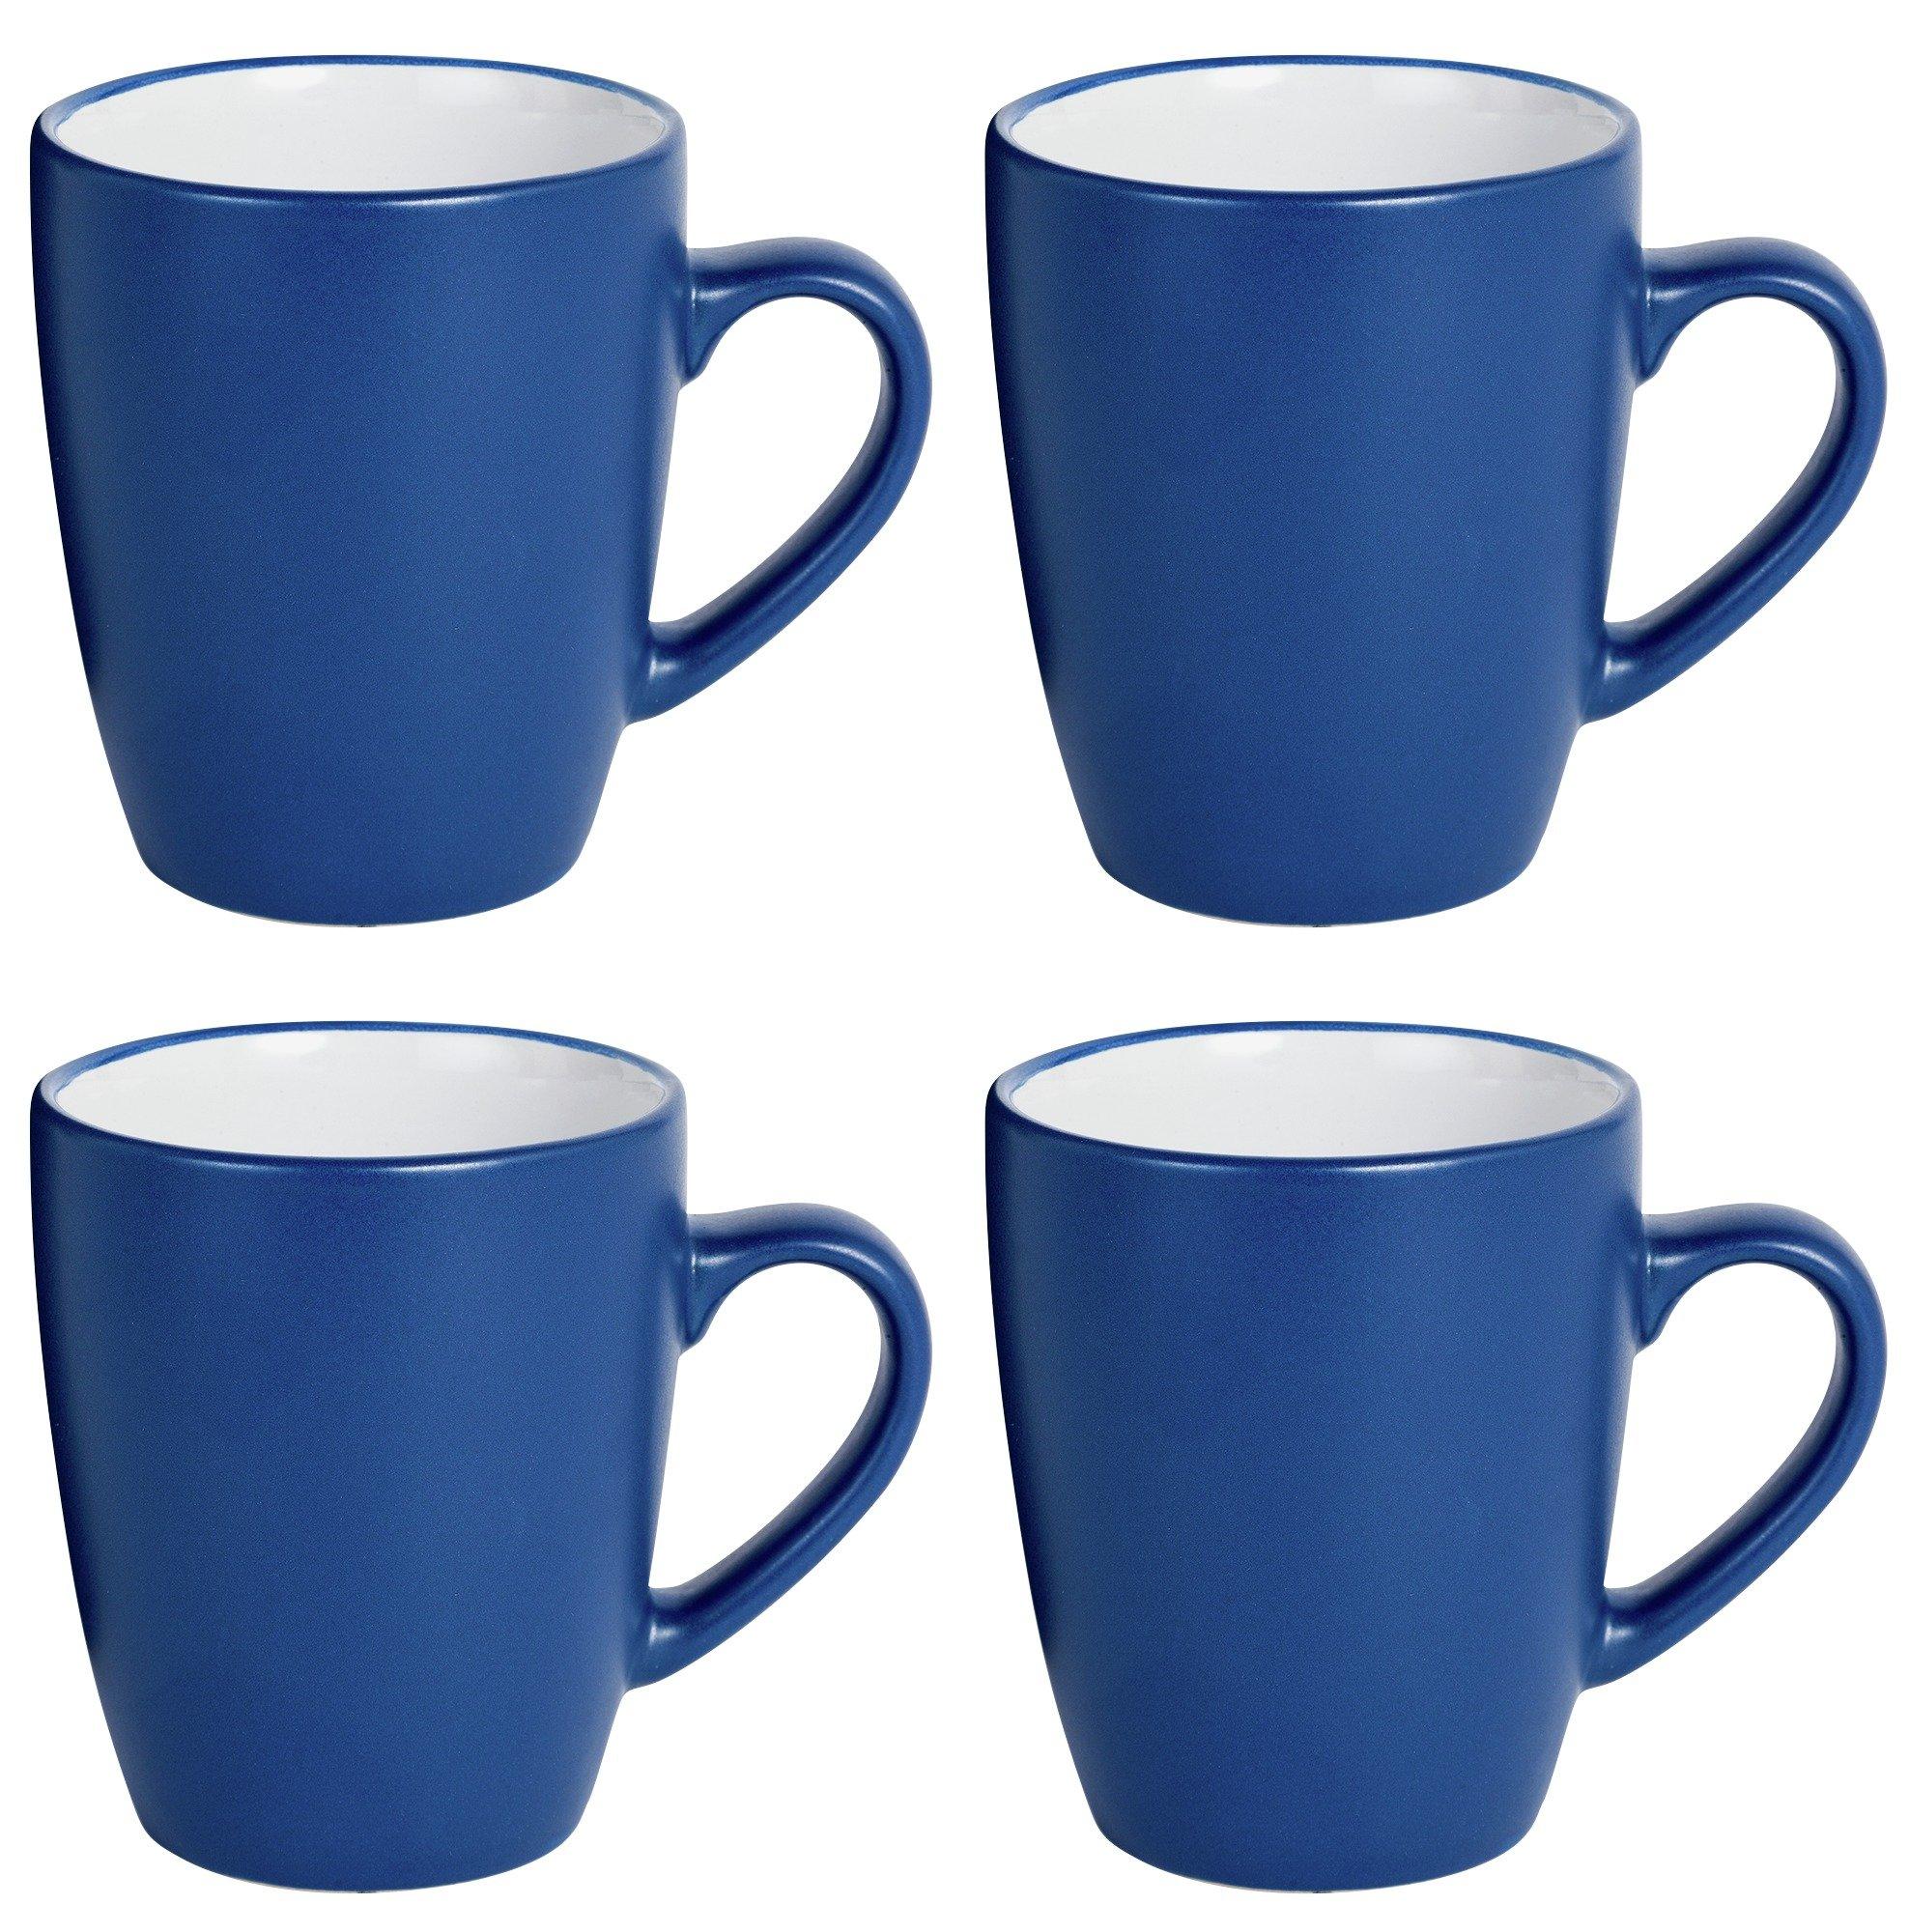 ColourMatch Set of 4 Mugs - Ink Blue.